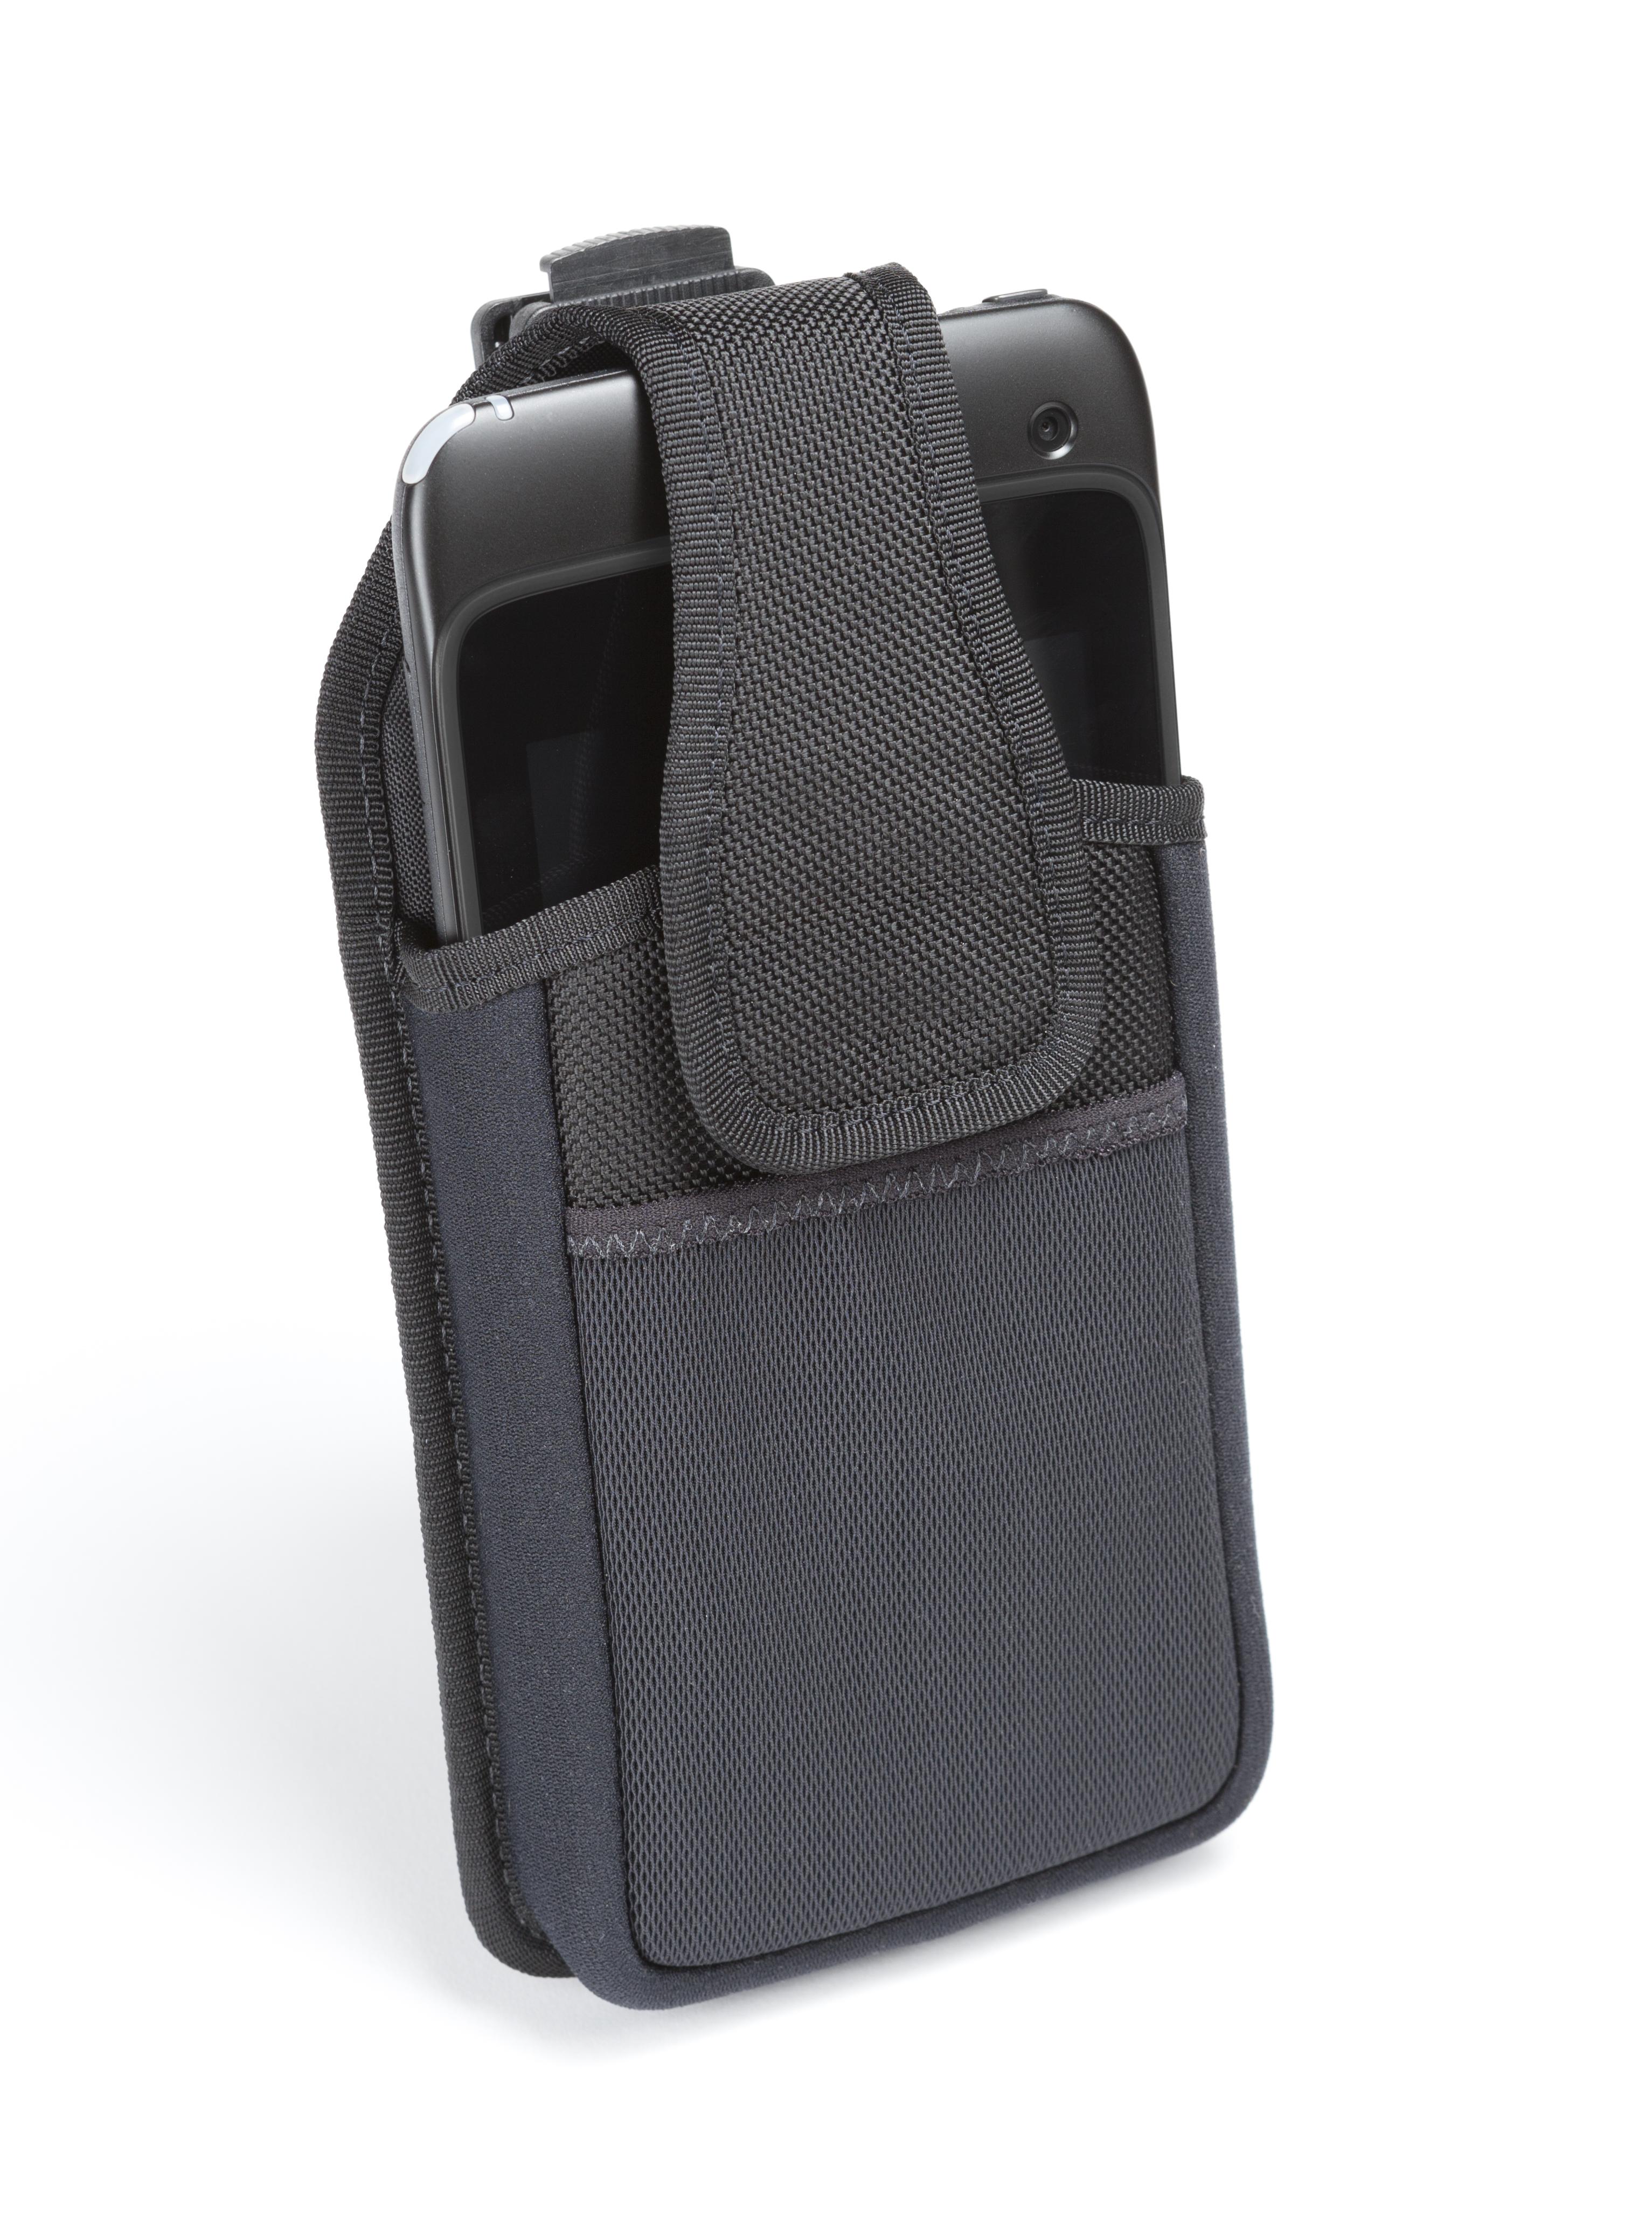 XT1 | Rugged Tablet | Janam Technologies